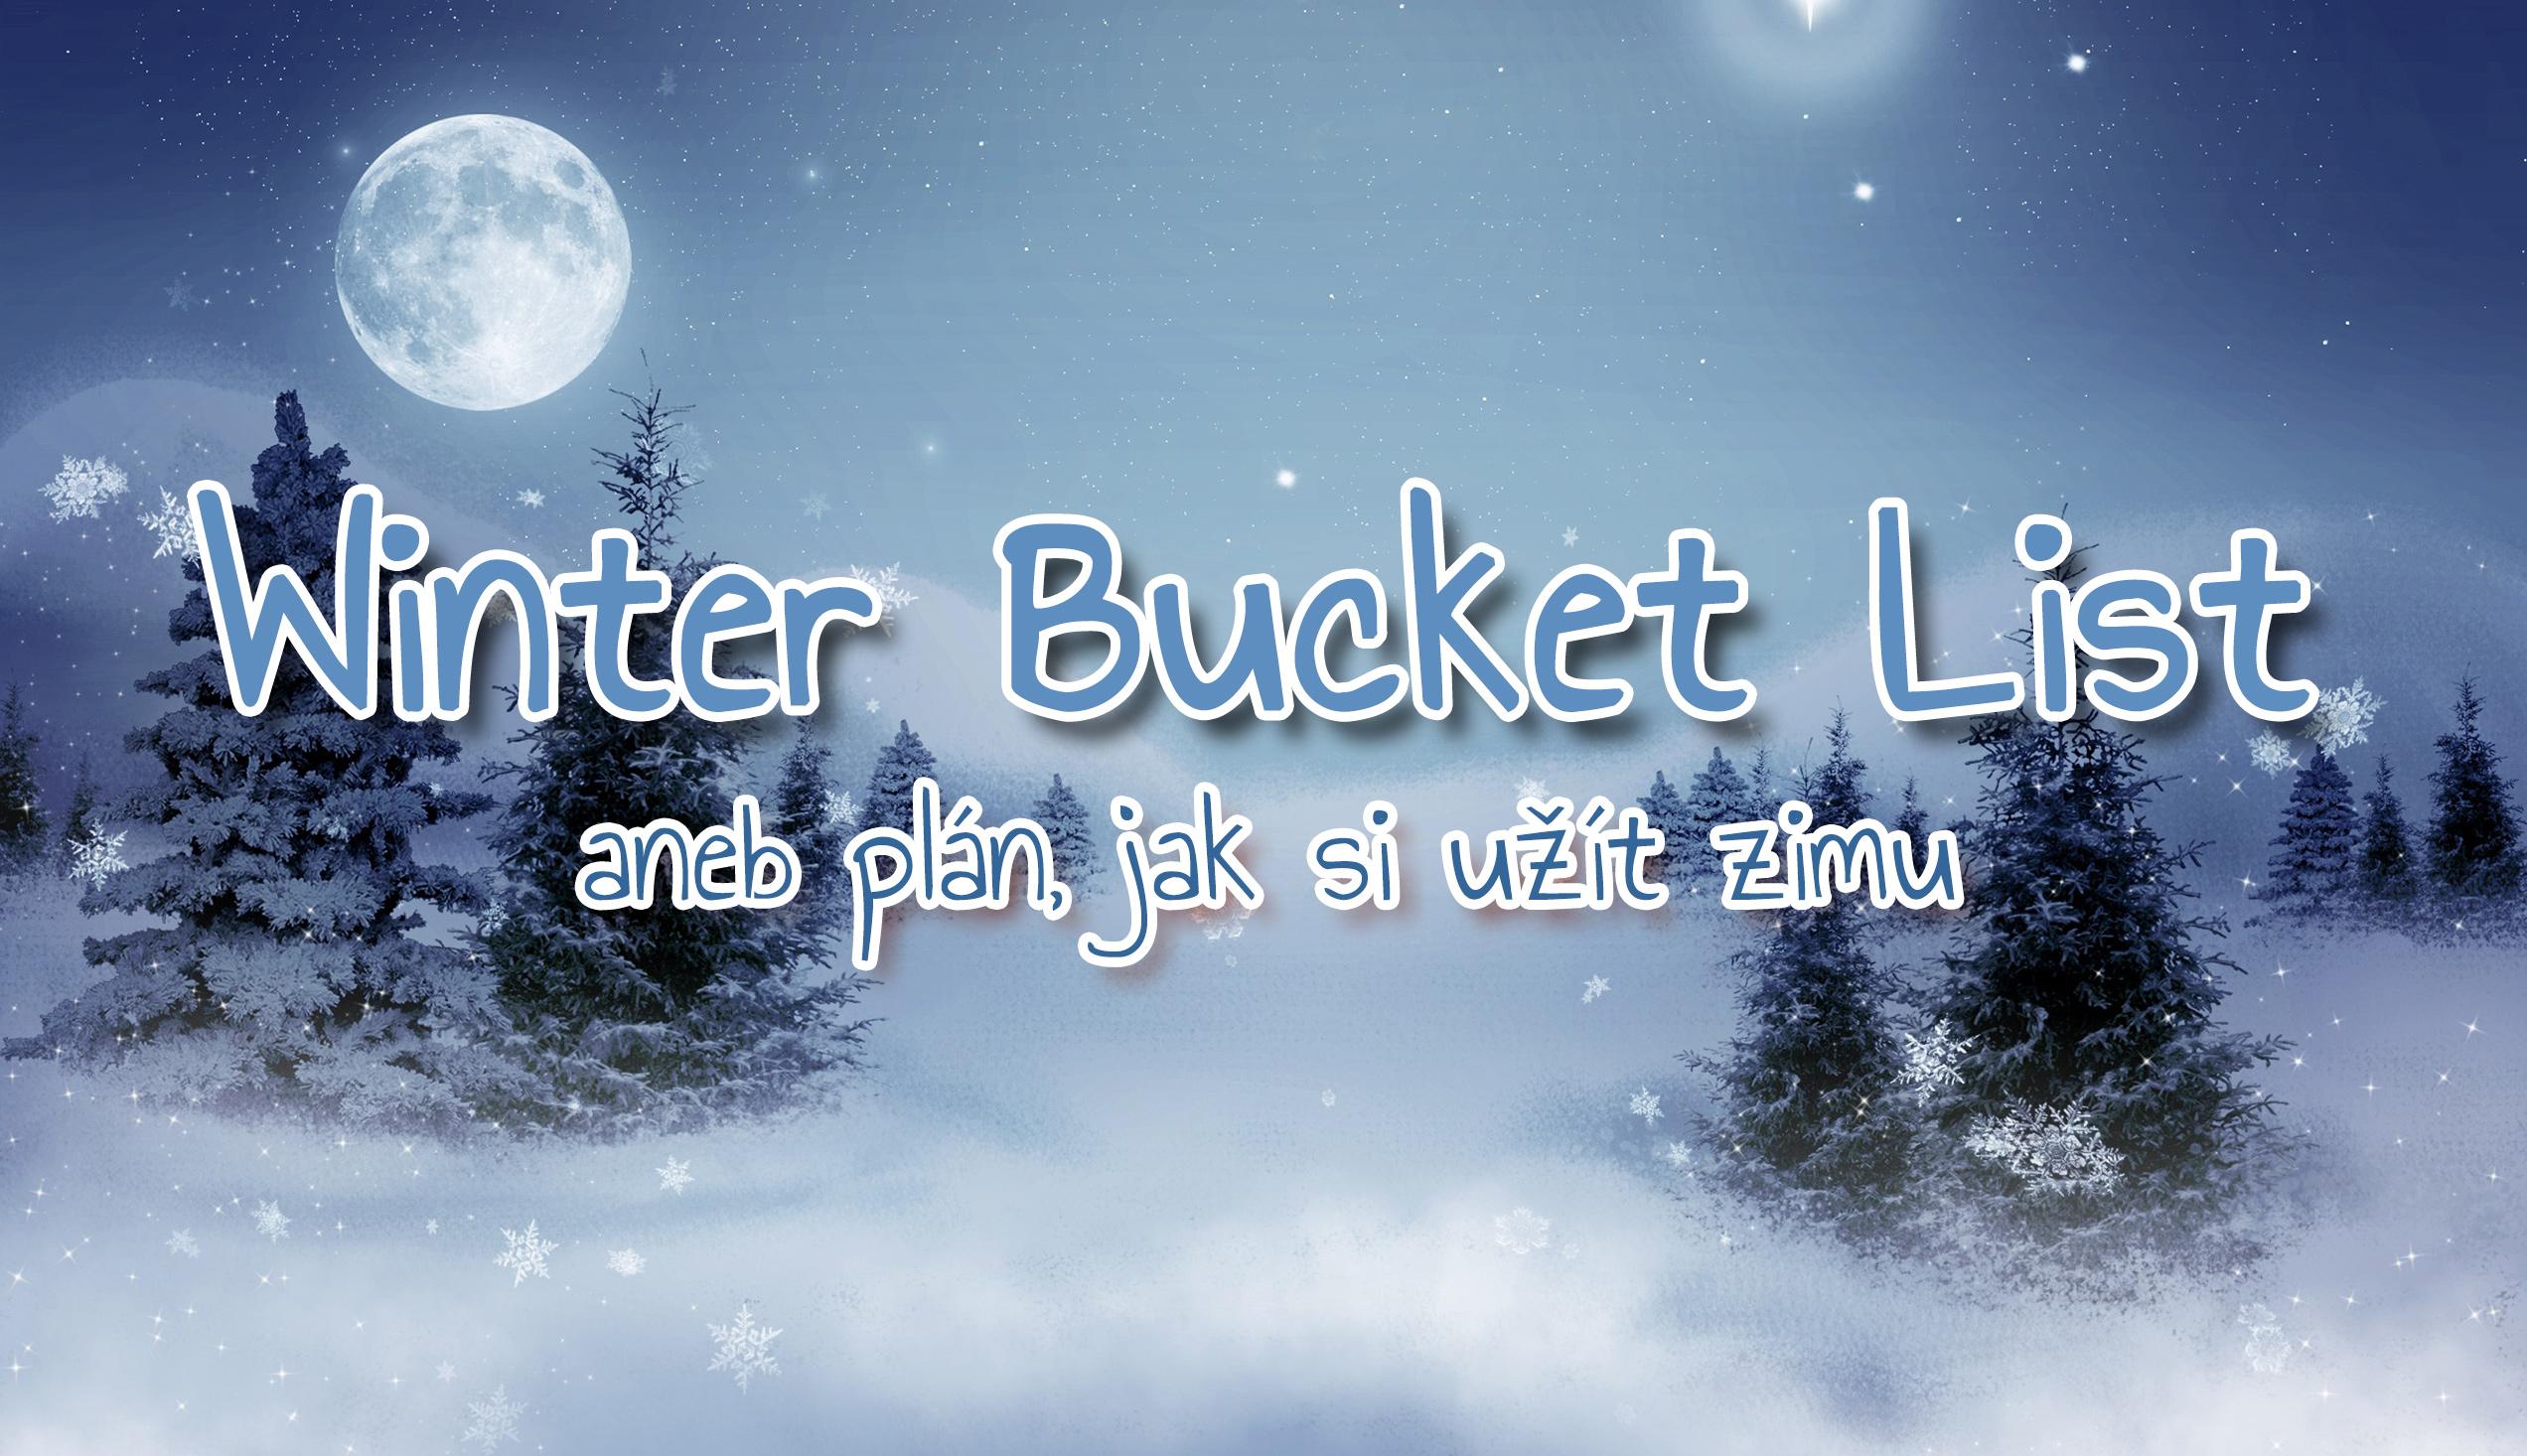 Winter Bucket List – aneb plán, jak si užít zimu